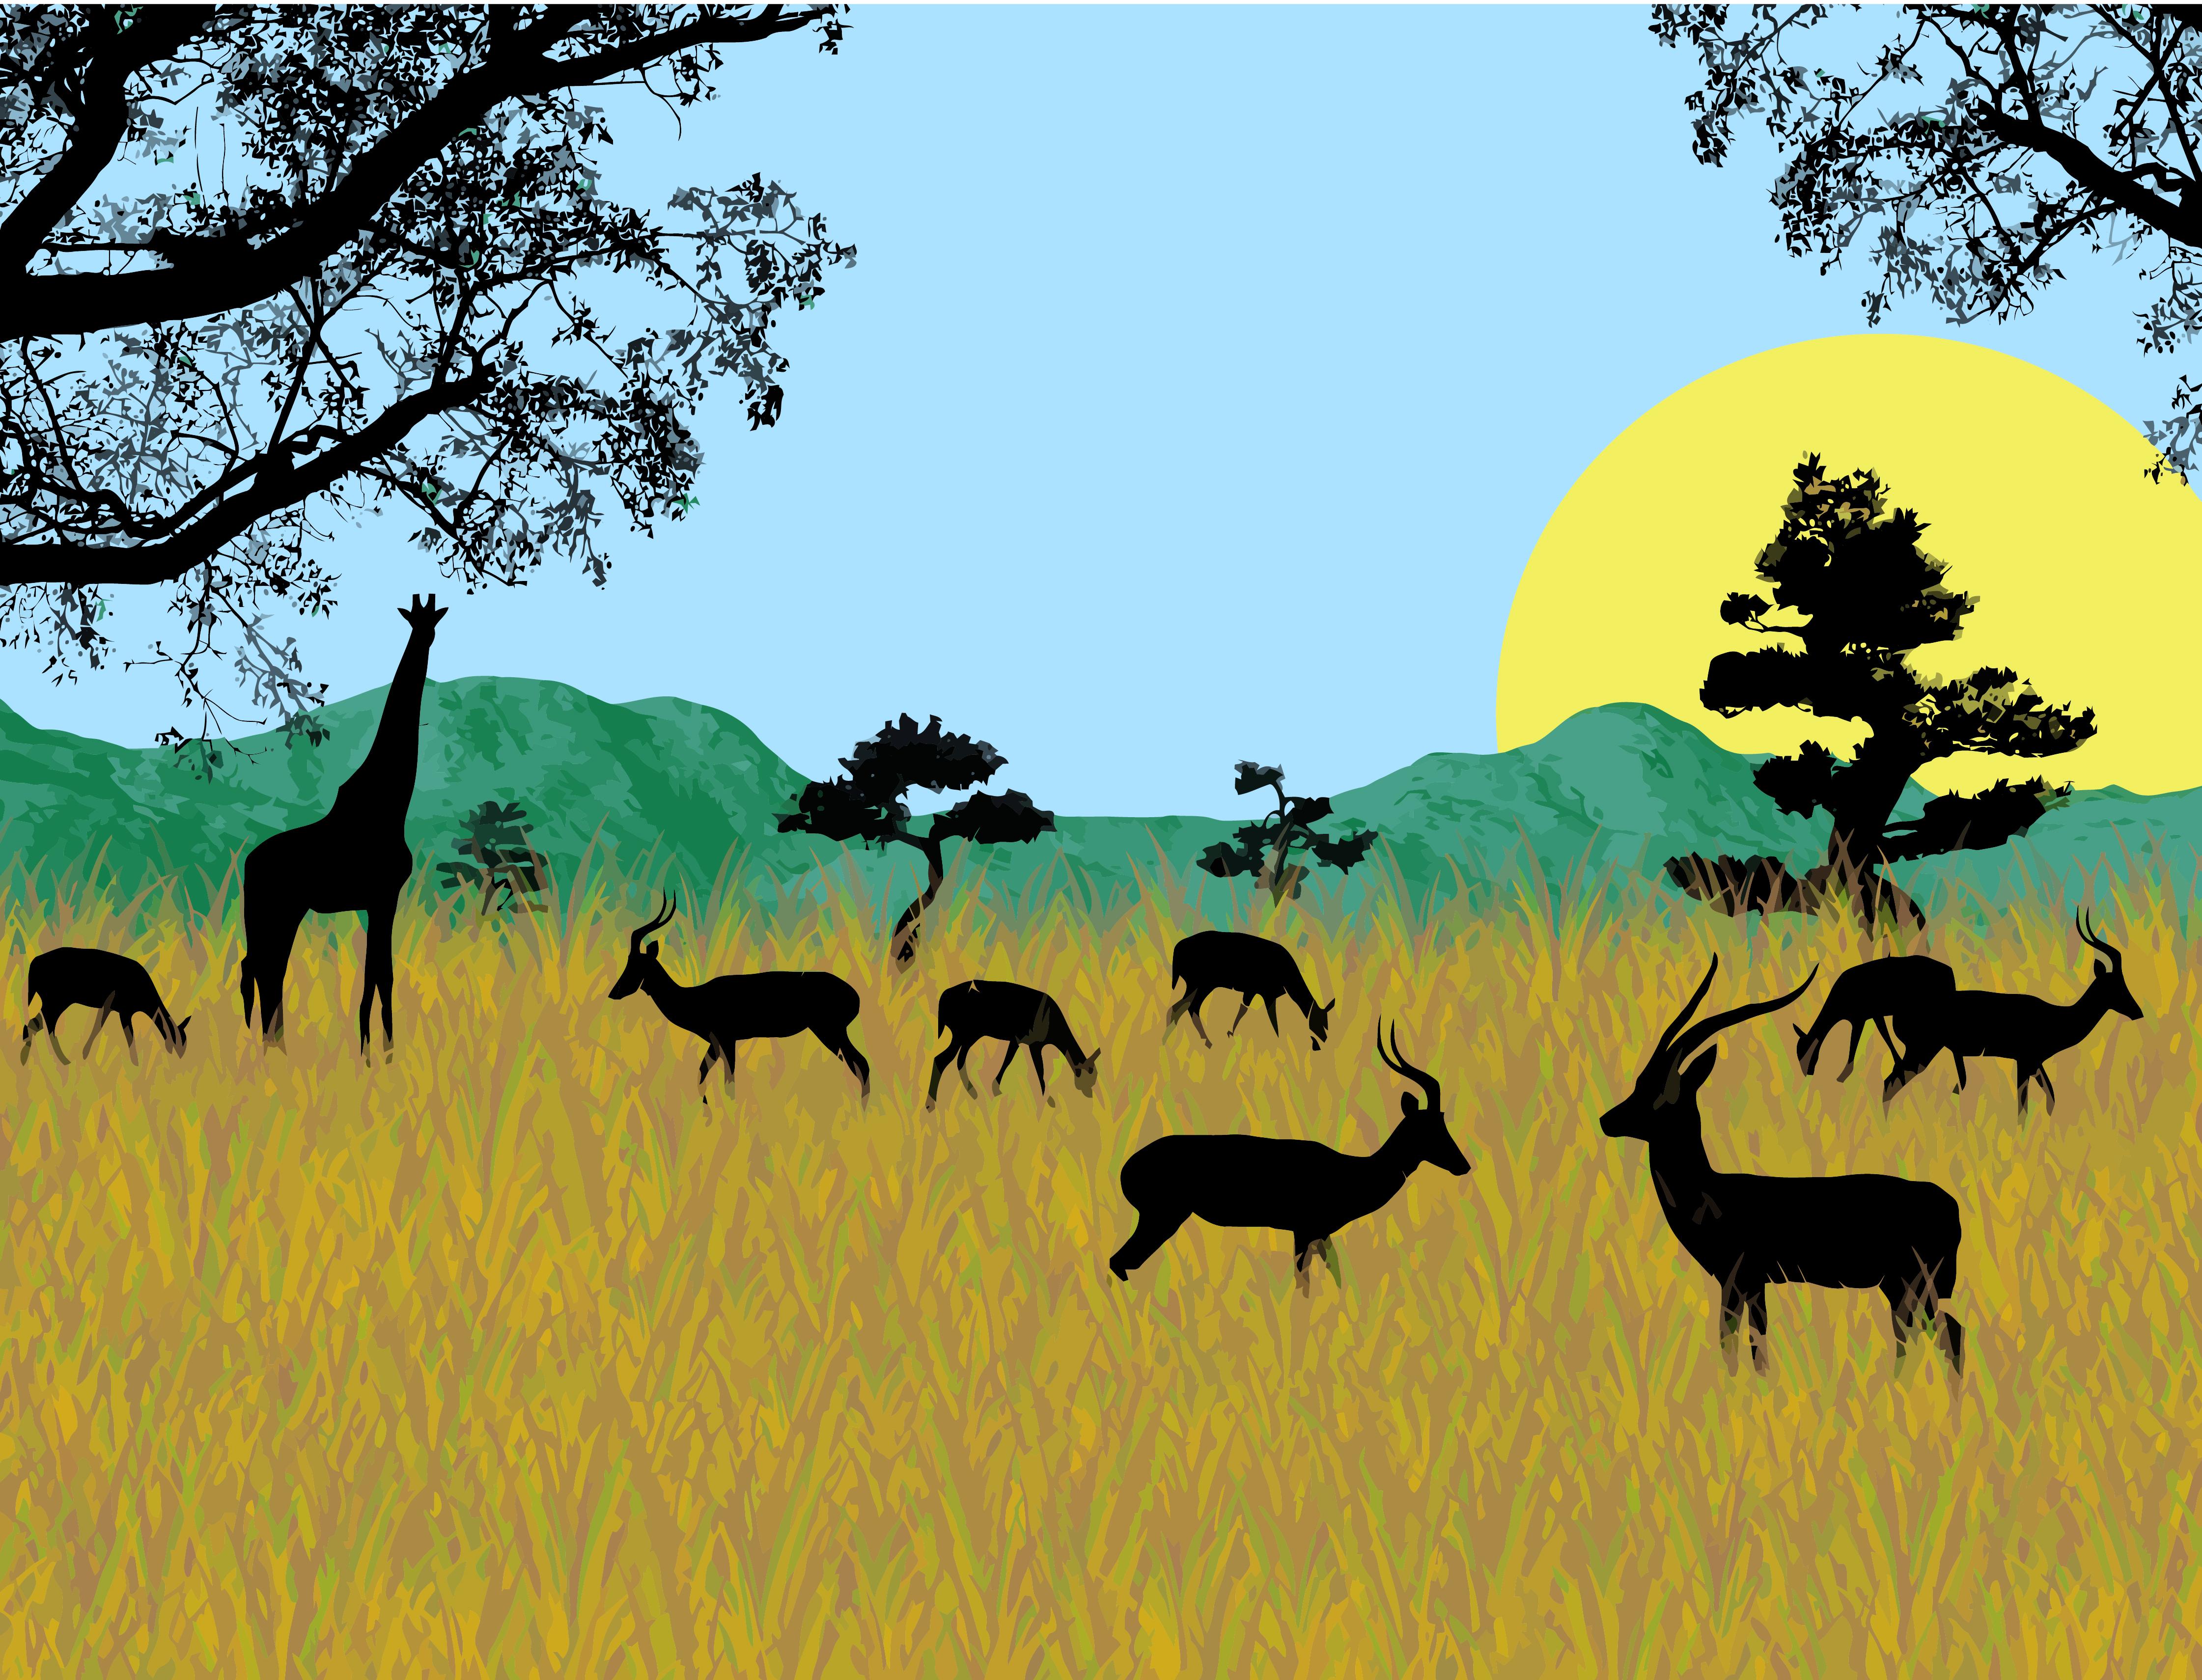 La savana africana silhouette di base erba antilope